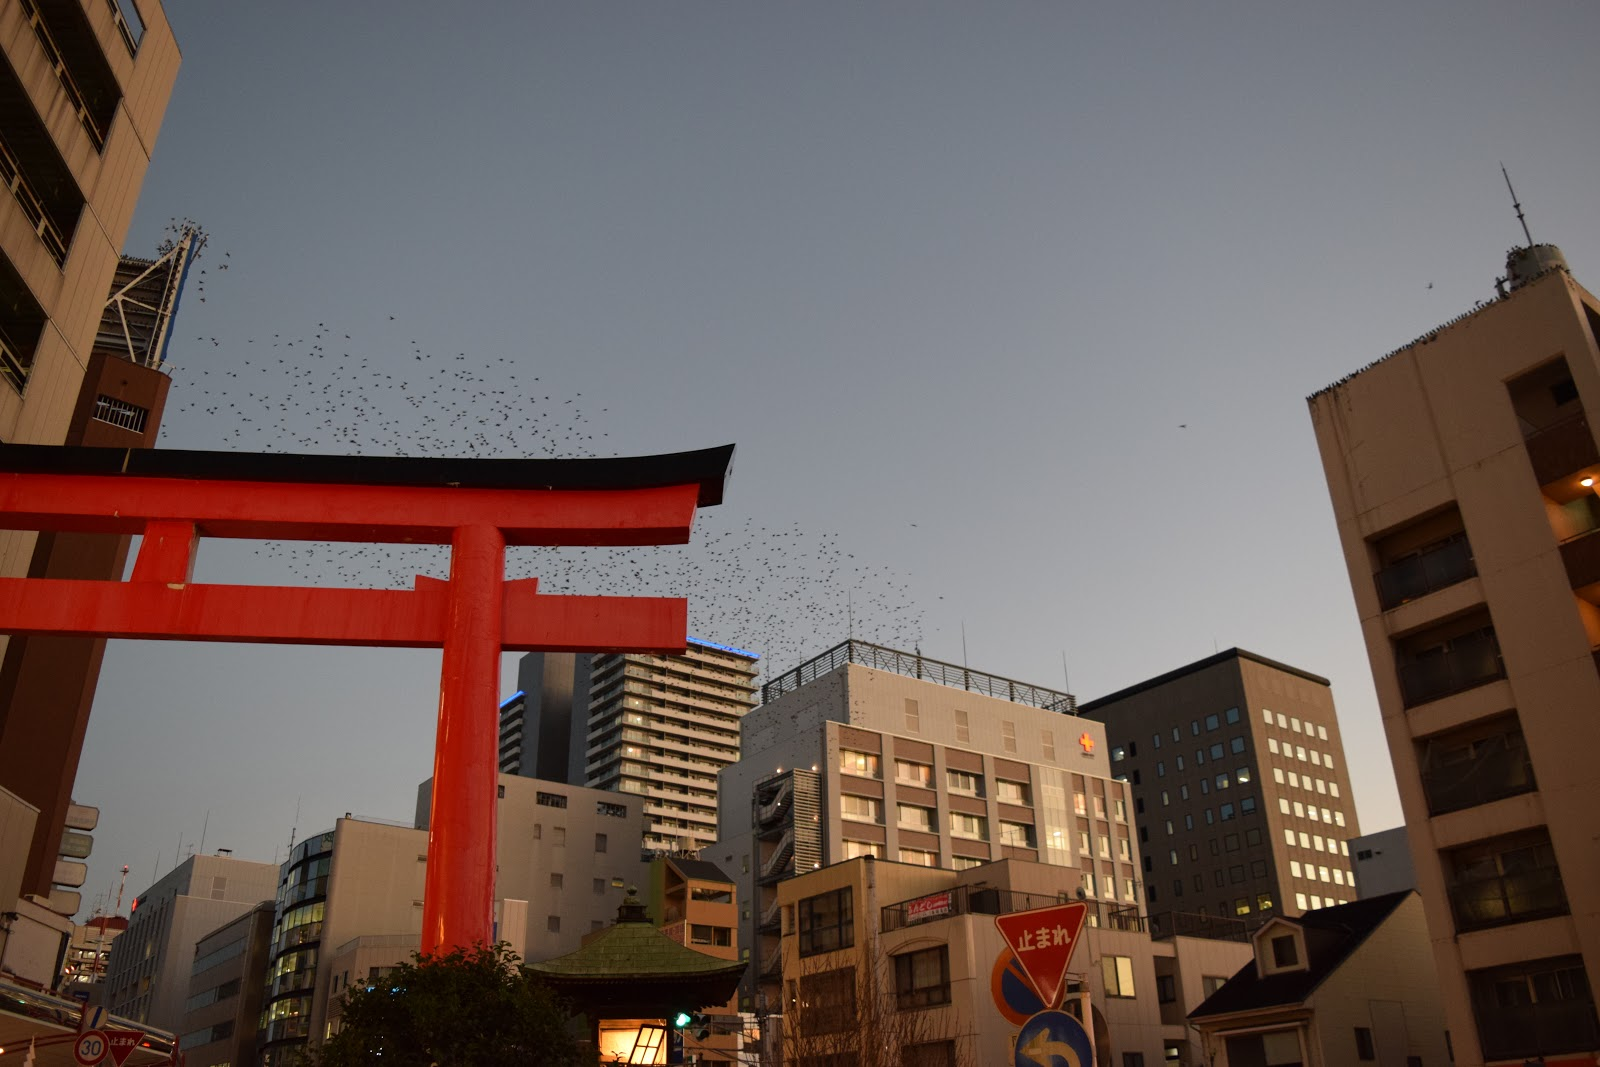 Sengen Dori Torii gate in Shizuoka City